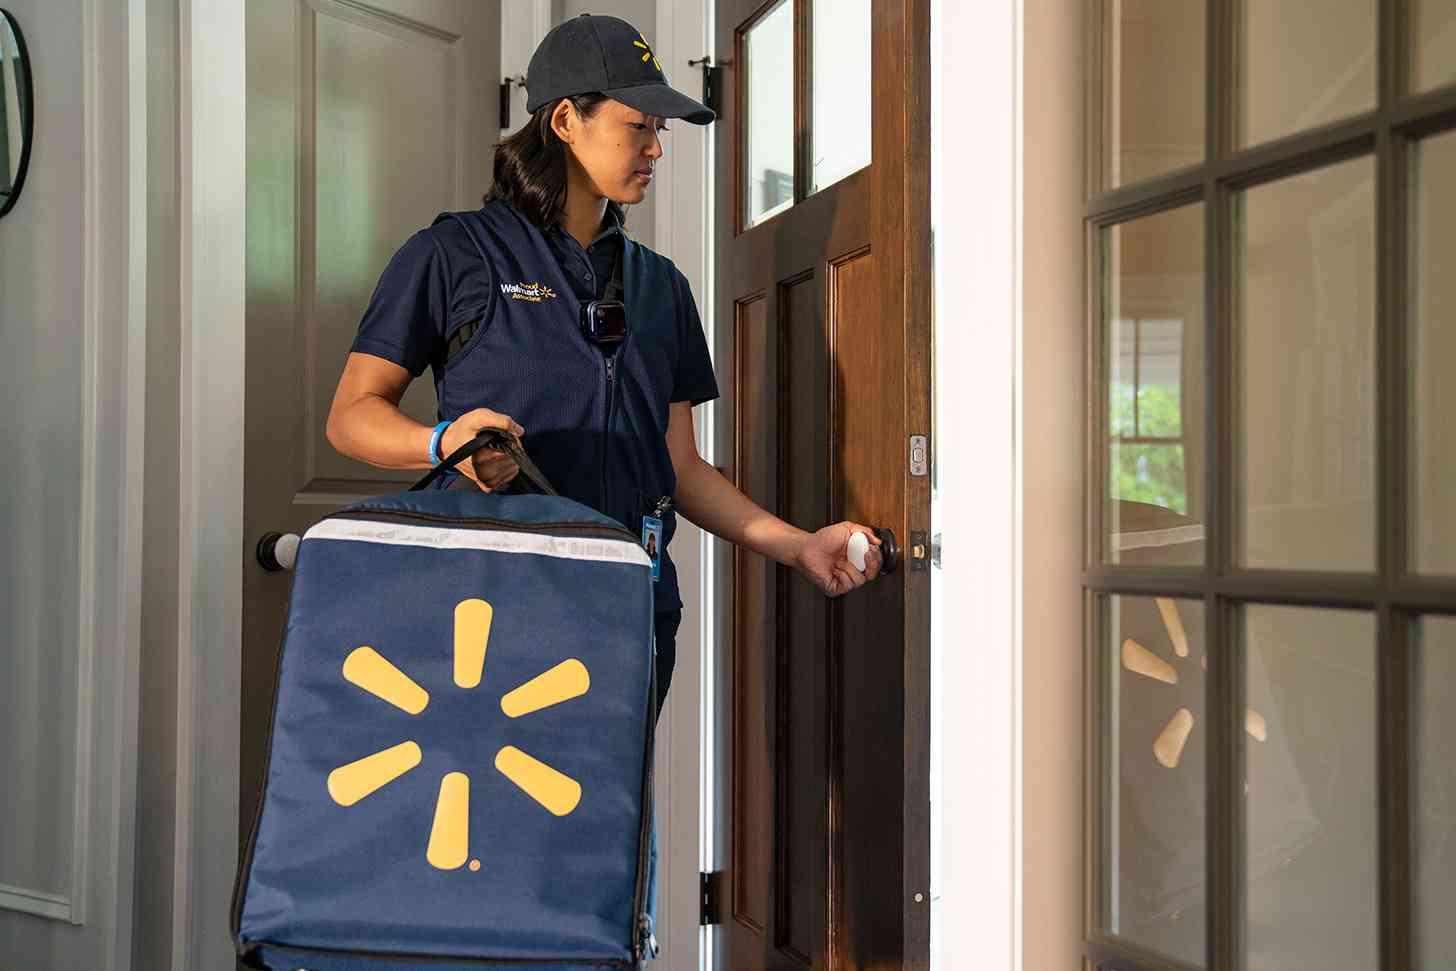 Walmart InHome Delivery groceries